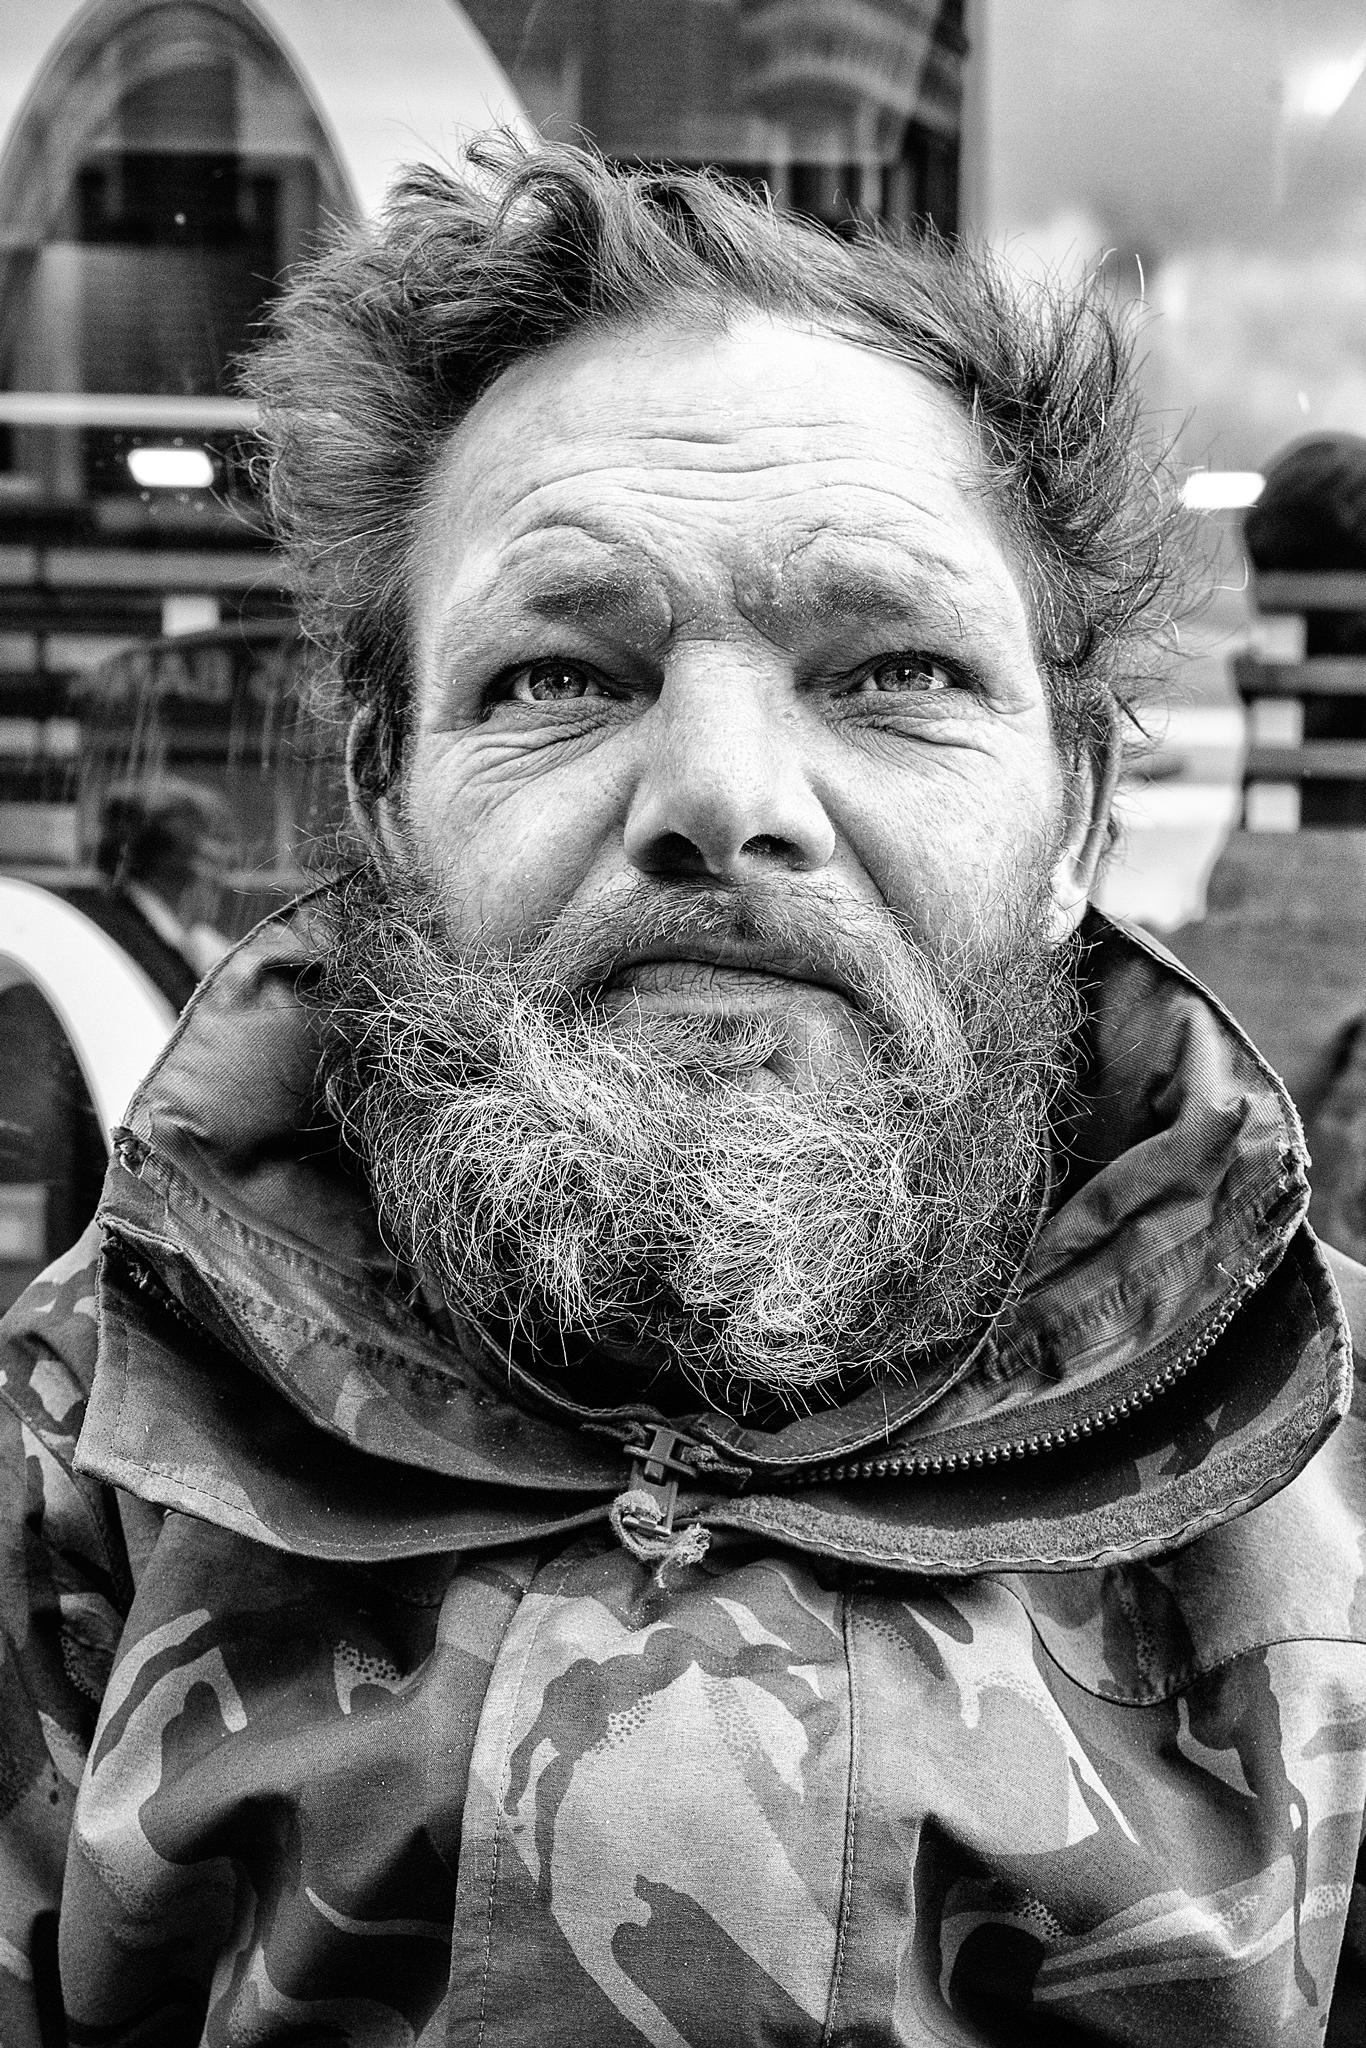 Homeless-Guy-Crop.png